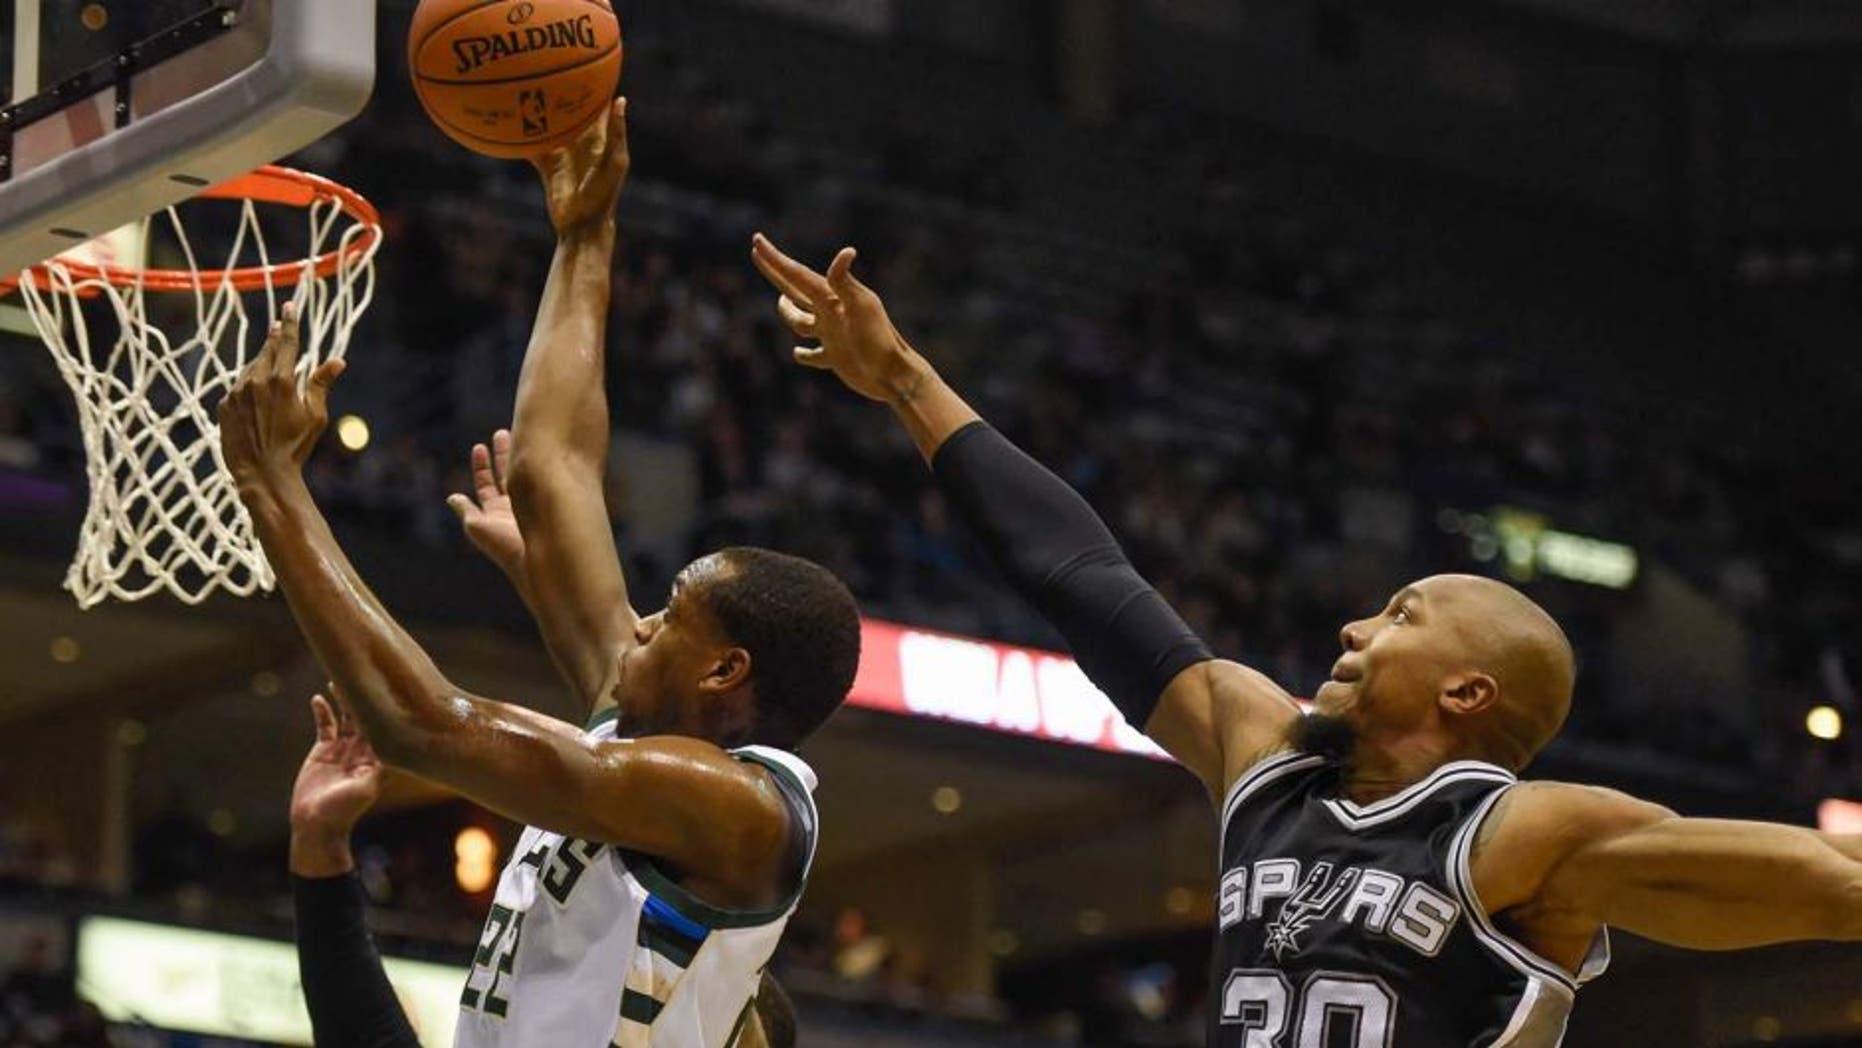 Monday, Jan. 4: Milwaukee Bucks guard Khris Middleton (left) takes a shot against San Antonio Spurs forward David West in the first quarter at BMO Harris Bradley Center in Milwaukee, Wis.